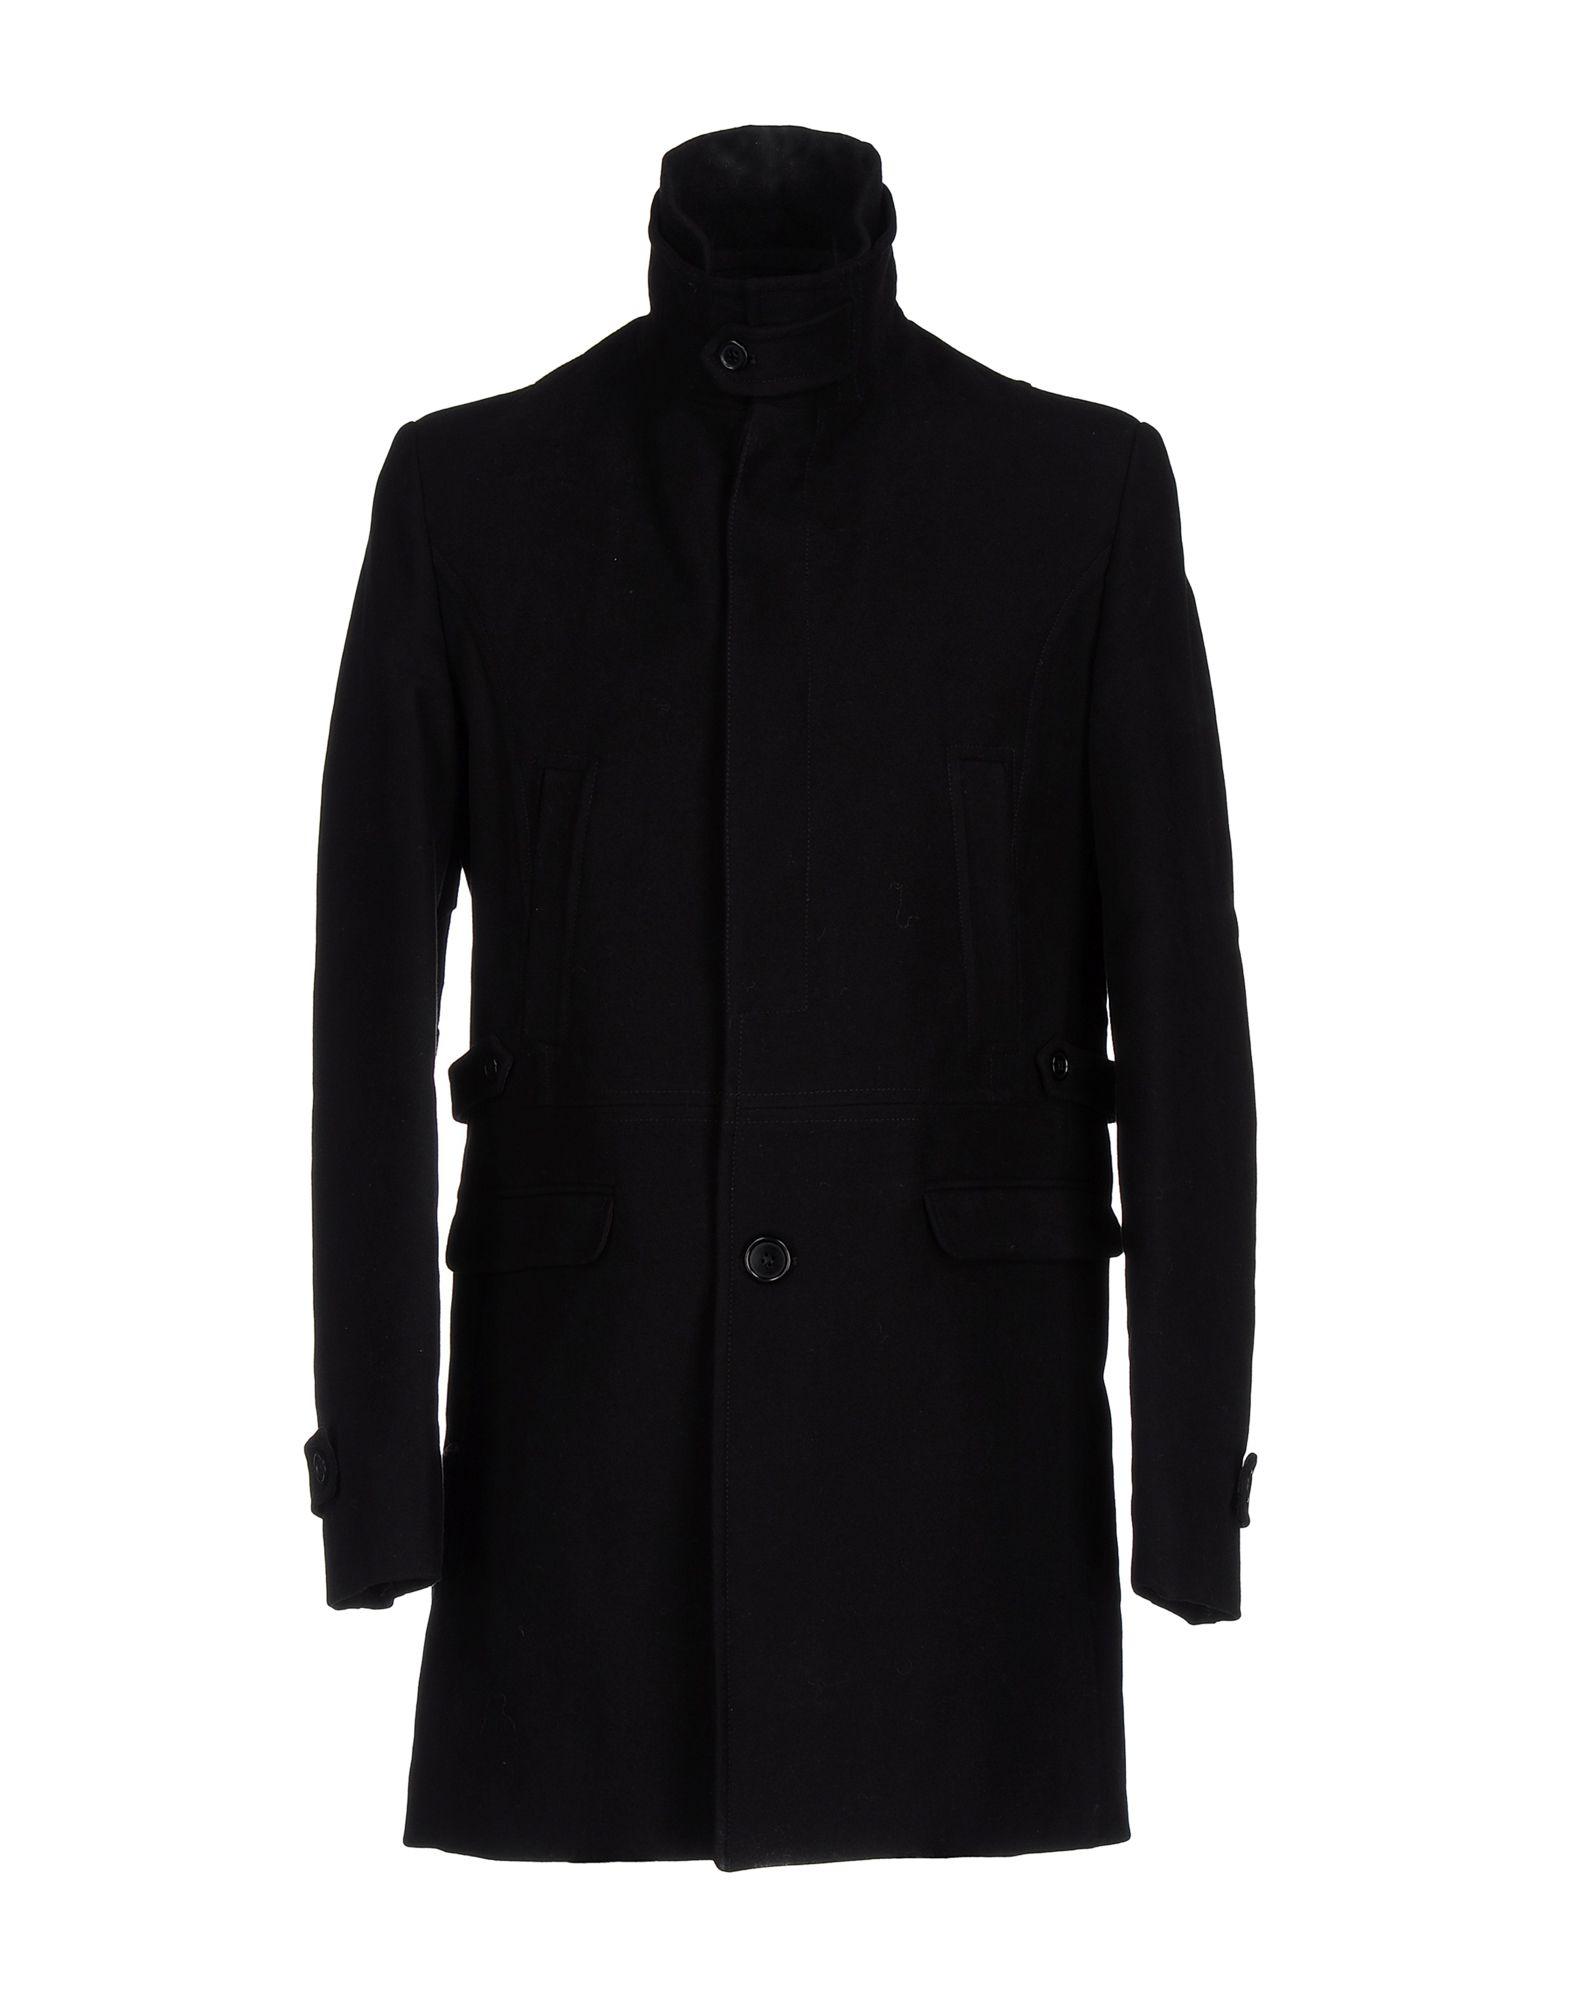 DAMA Coats in Black